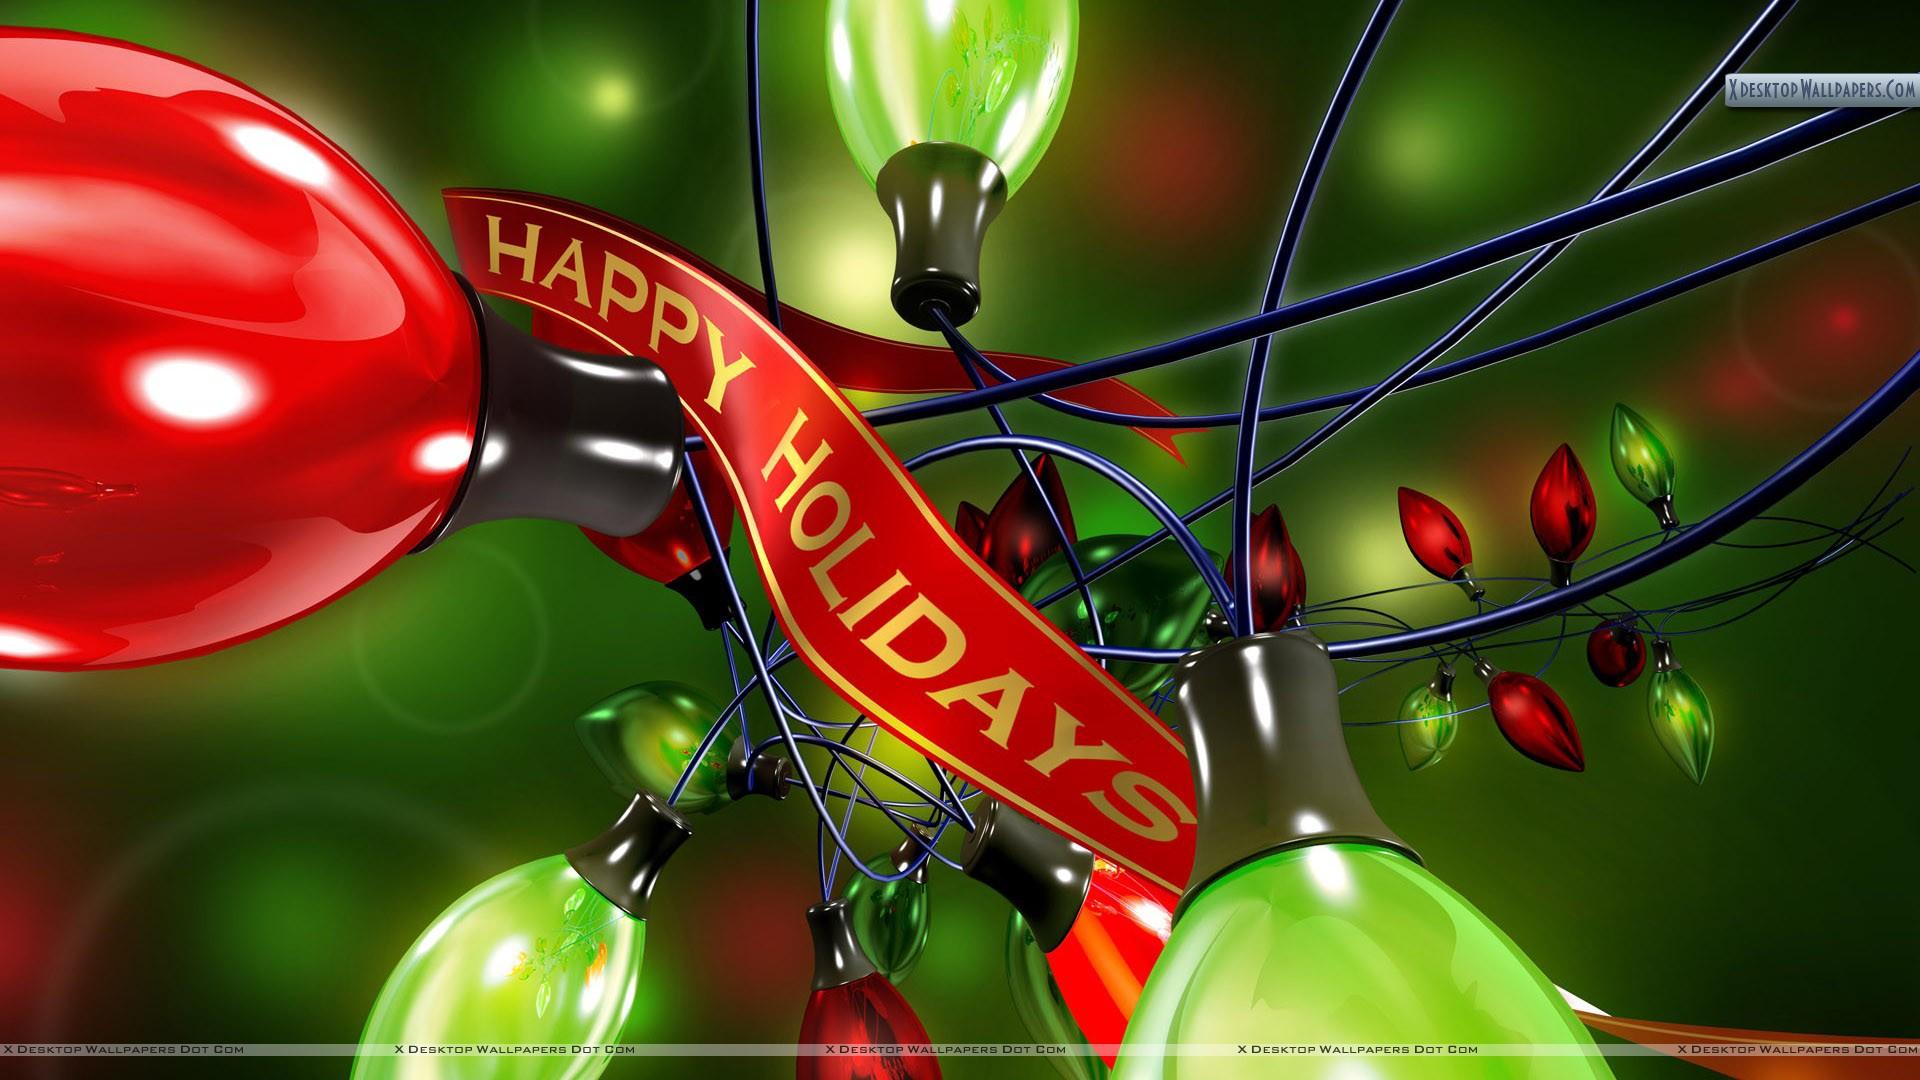 Happy Holidays Wallpaper 1920x1080